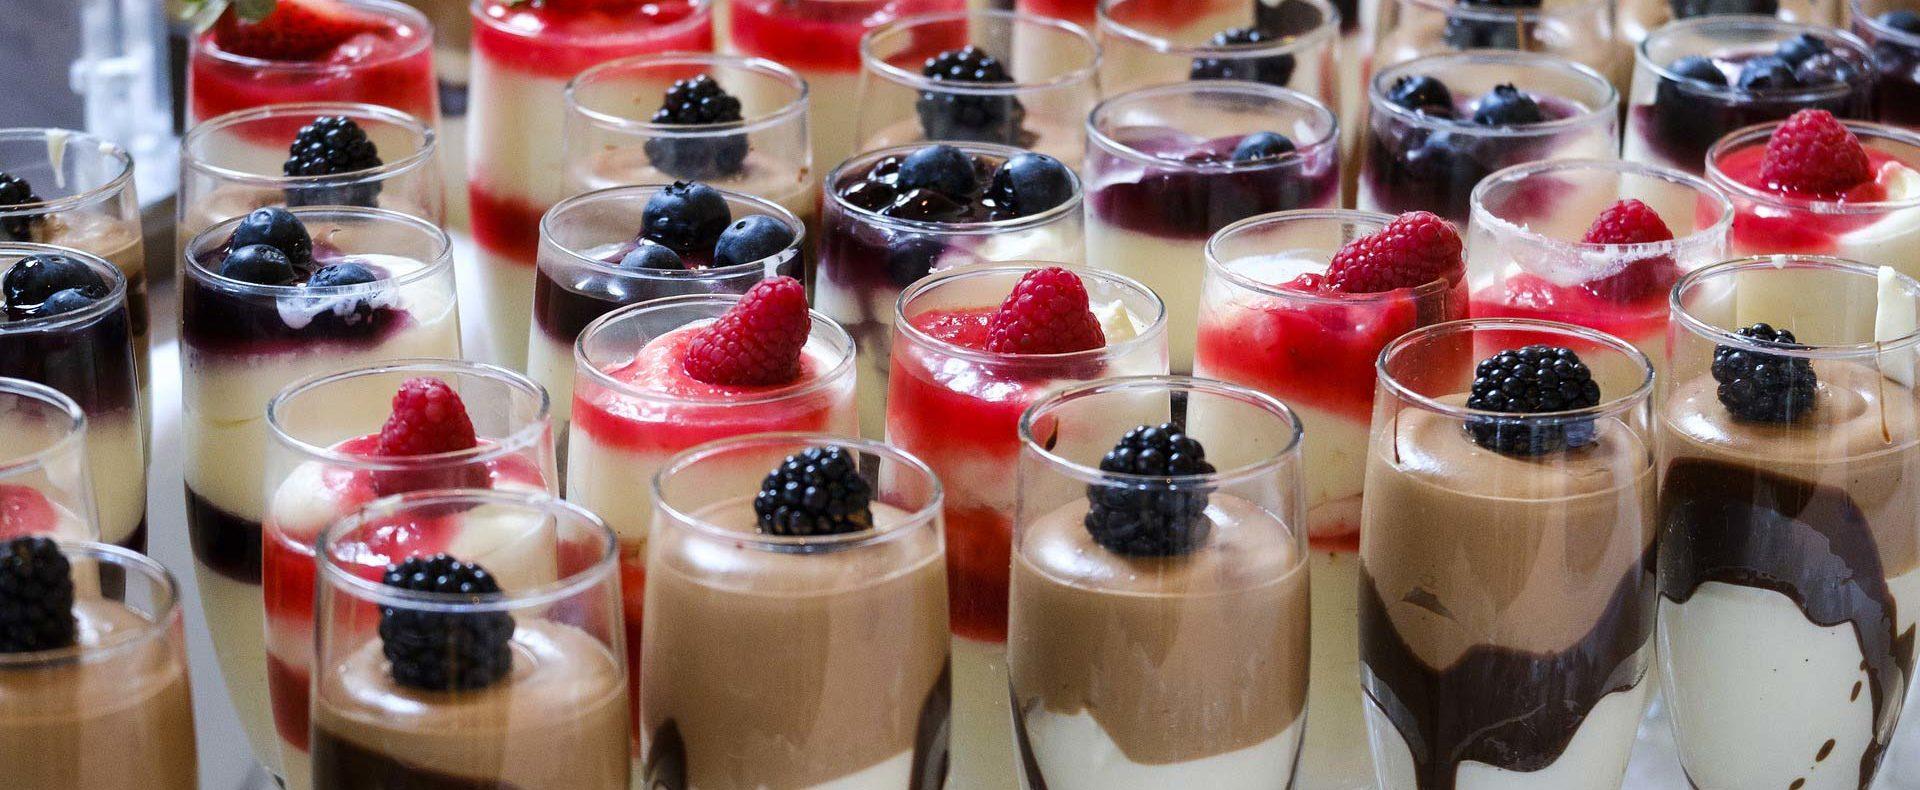 Catering / Partyservice - Mousse au Chocolat